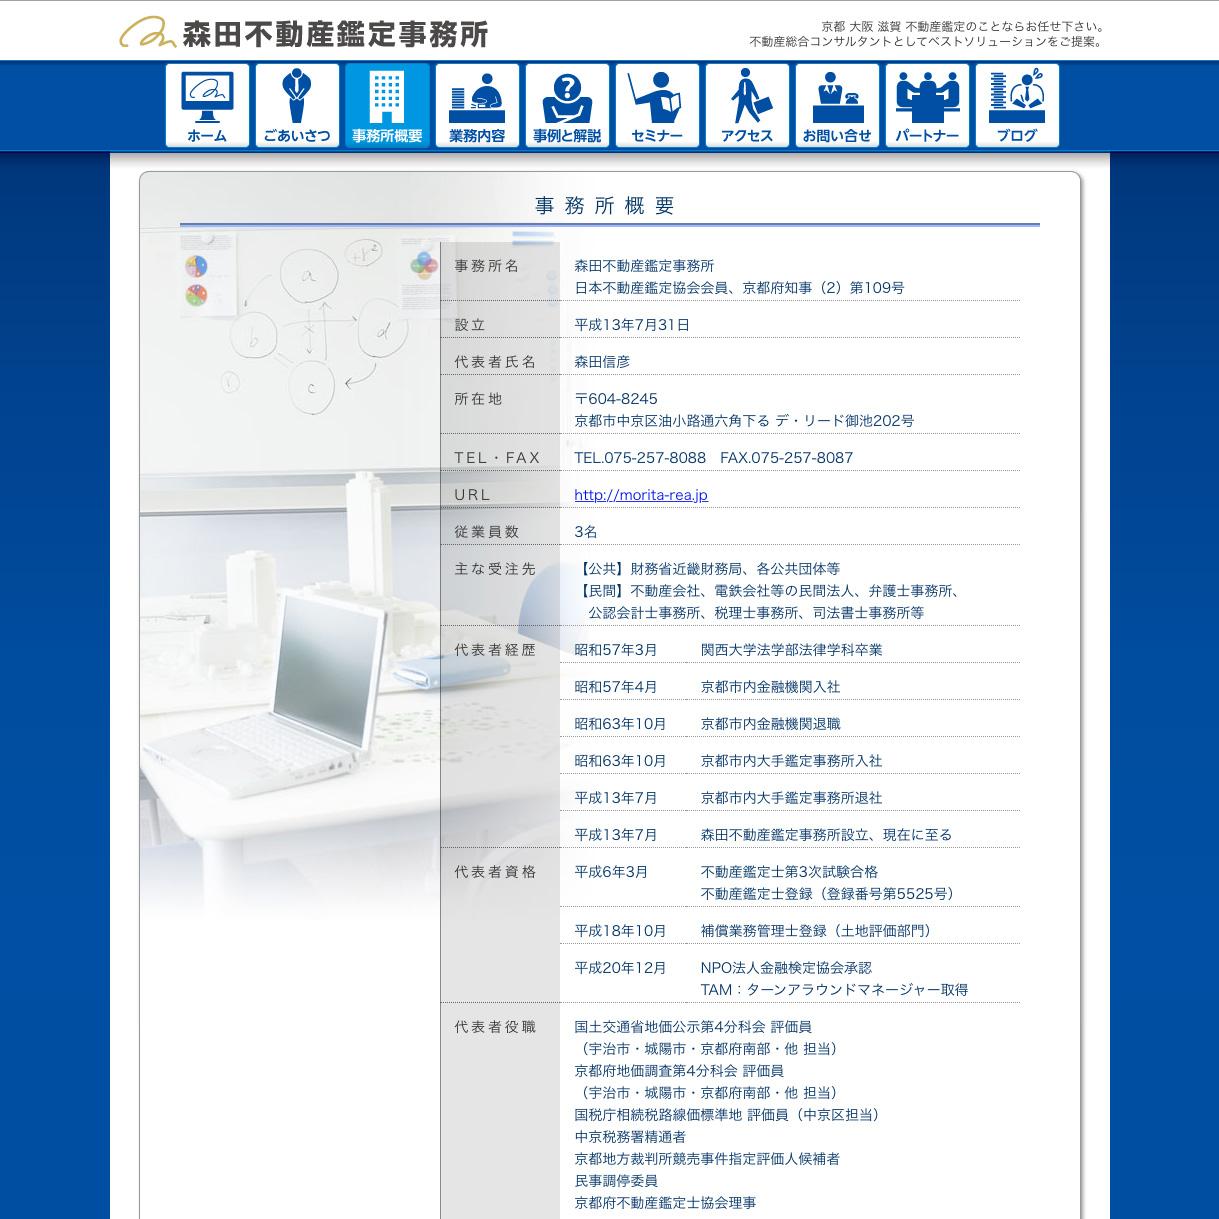 森田不動産鑑定事務所の会社概要ページ